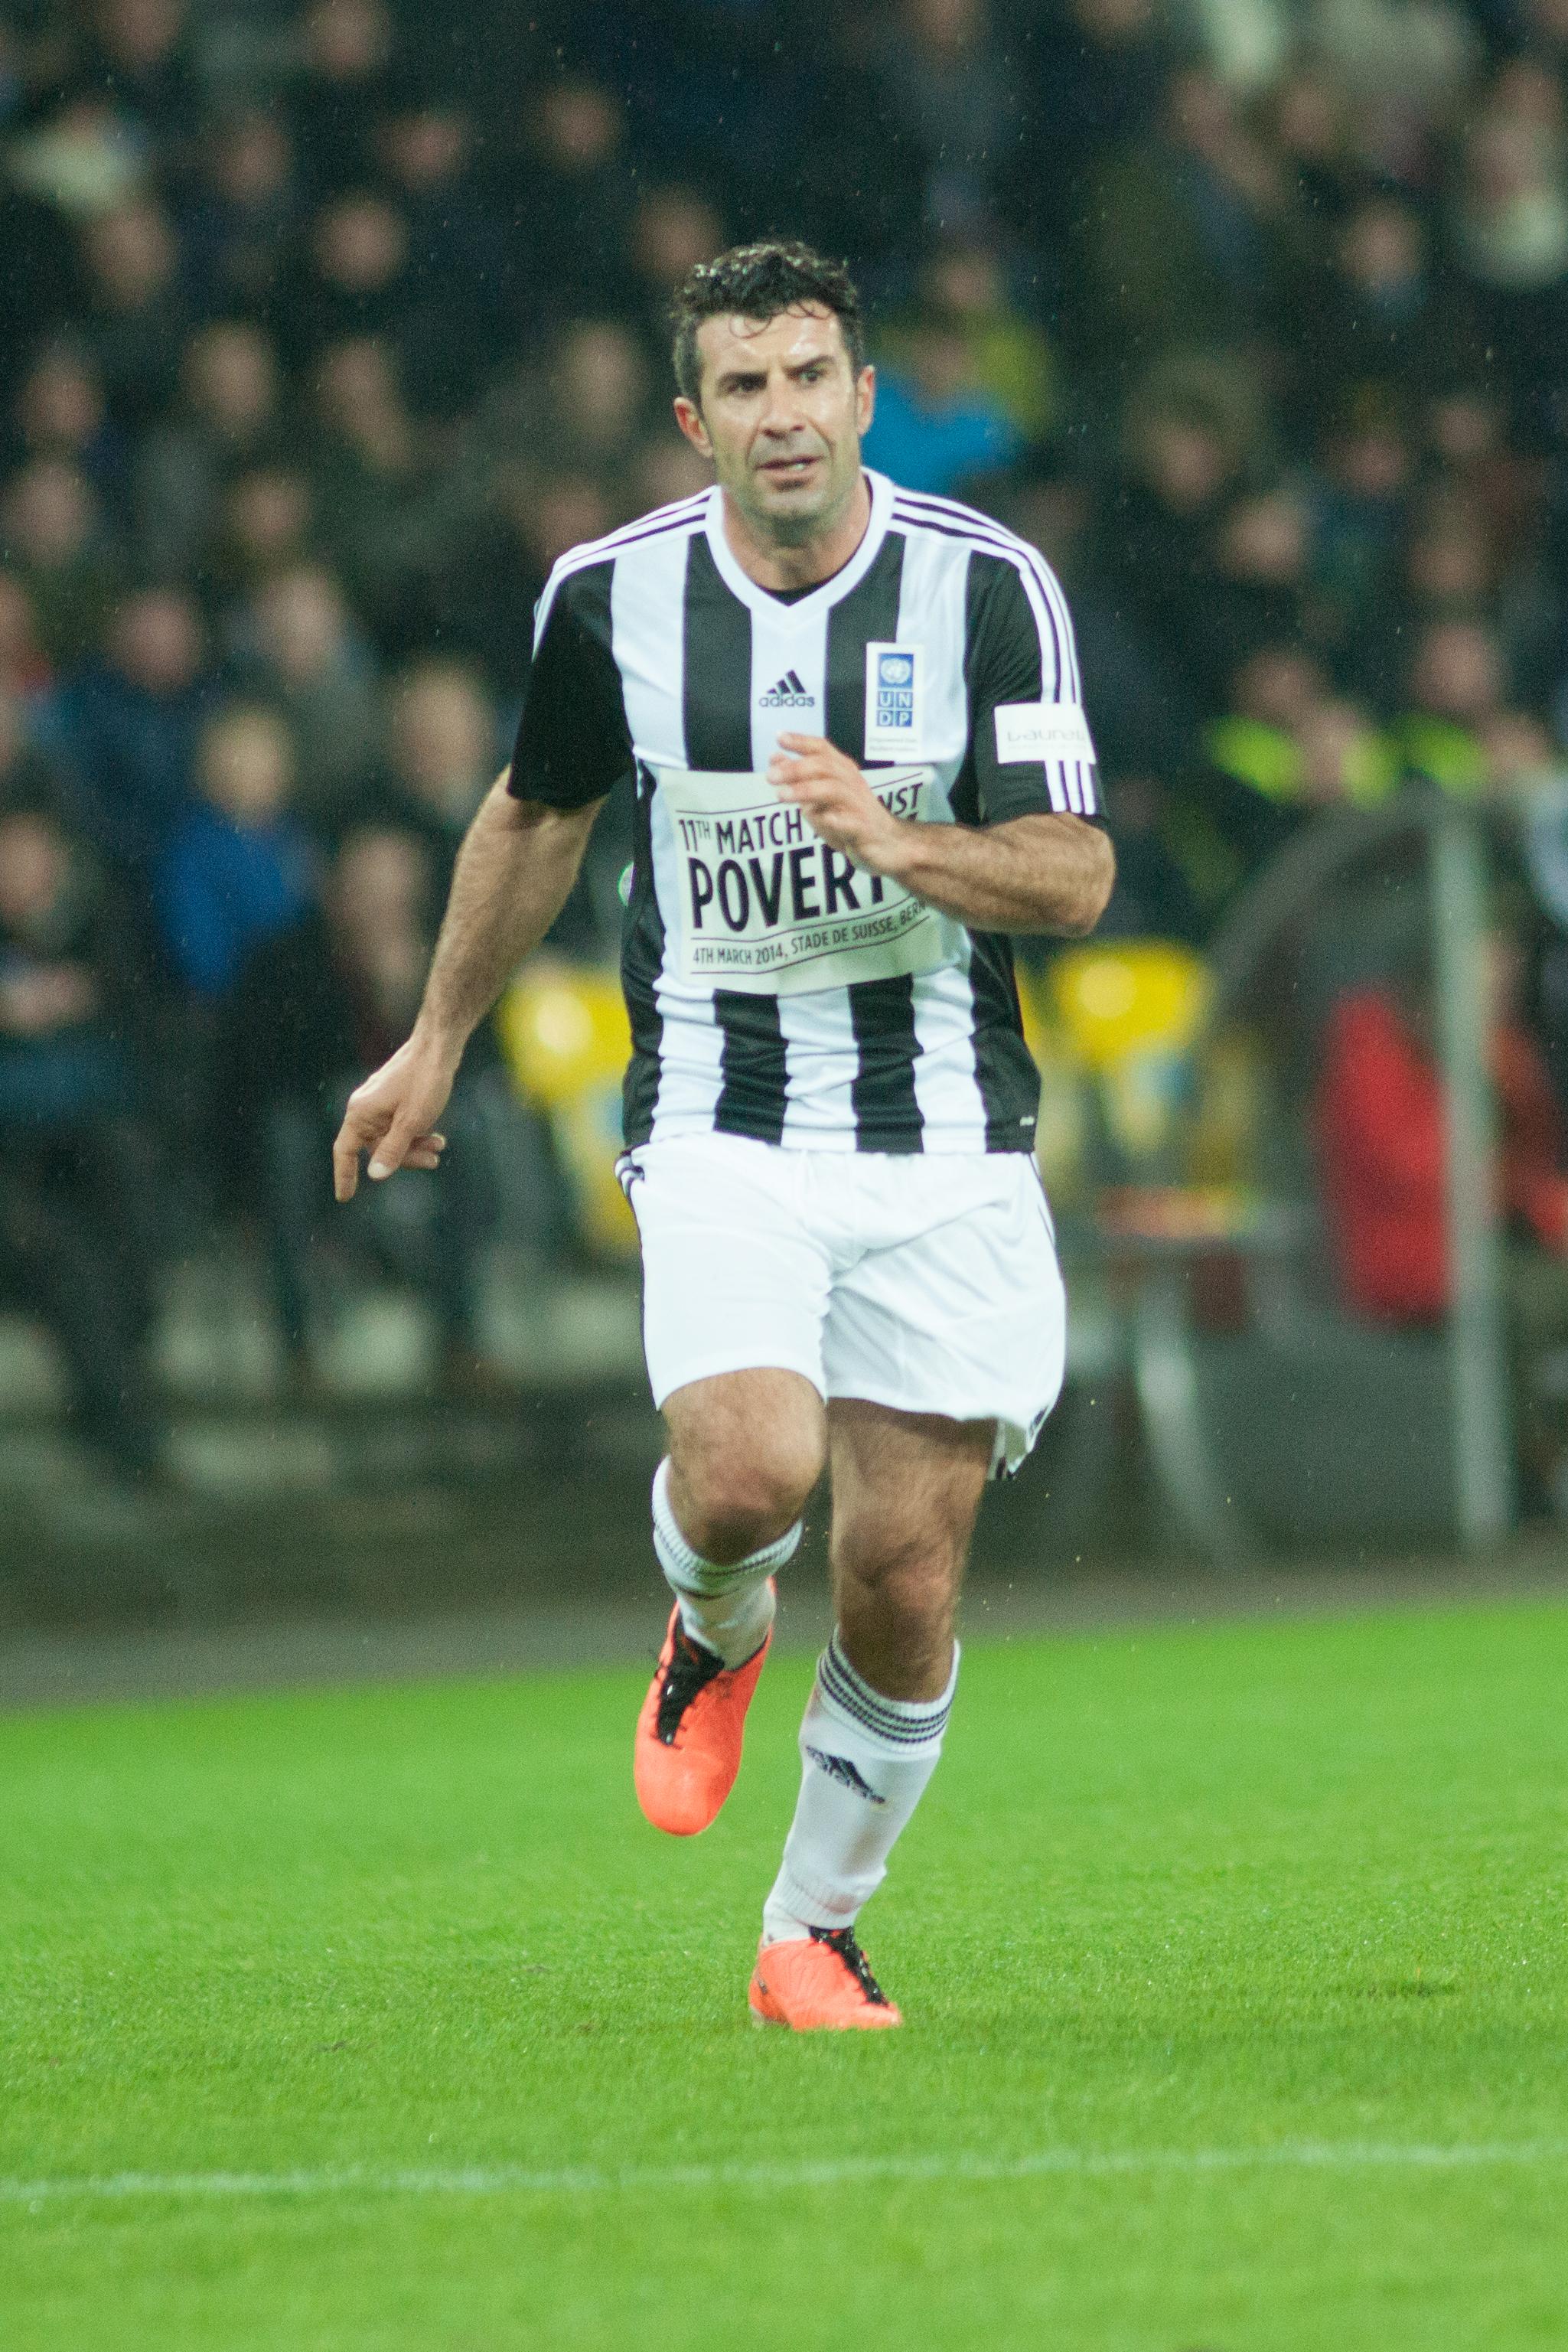 File Football against poverty 2014 Luis Figo 2 Wikimedia